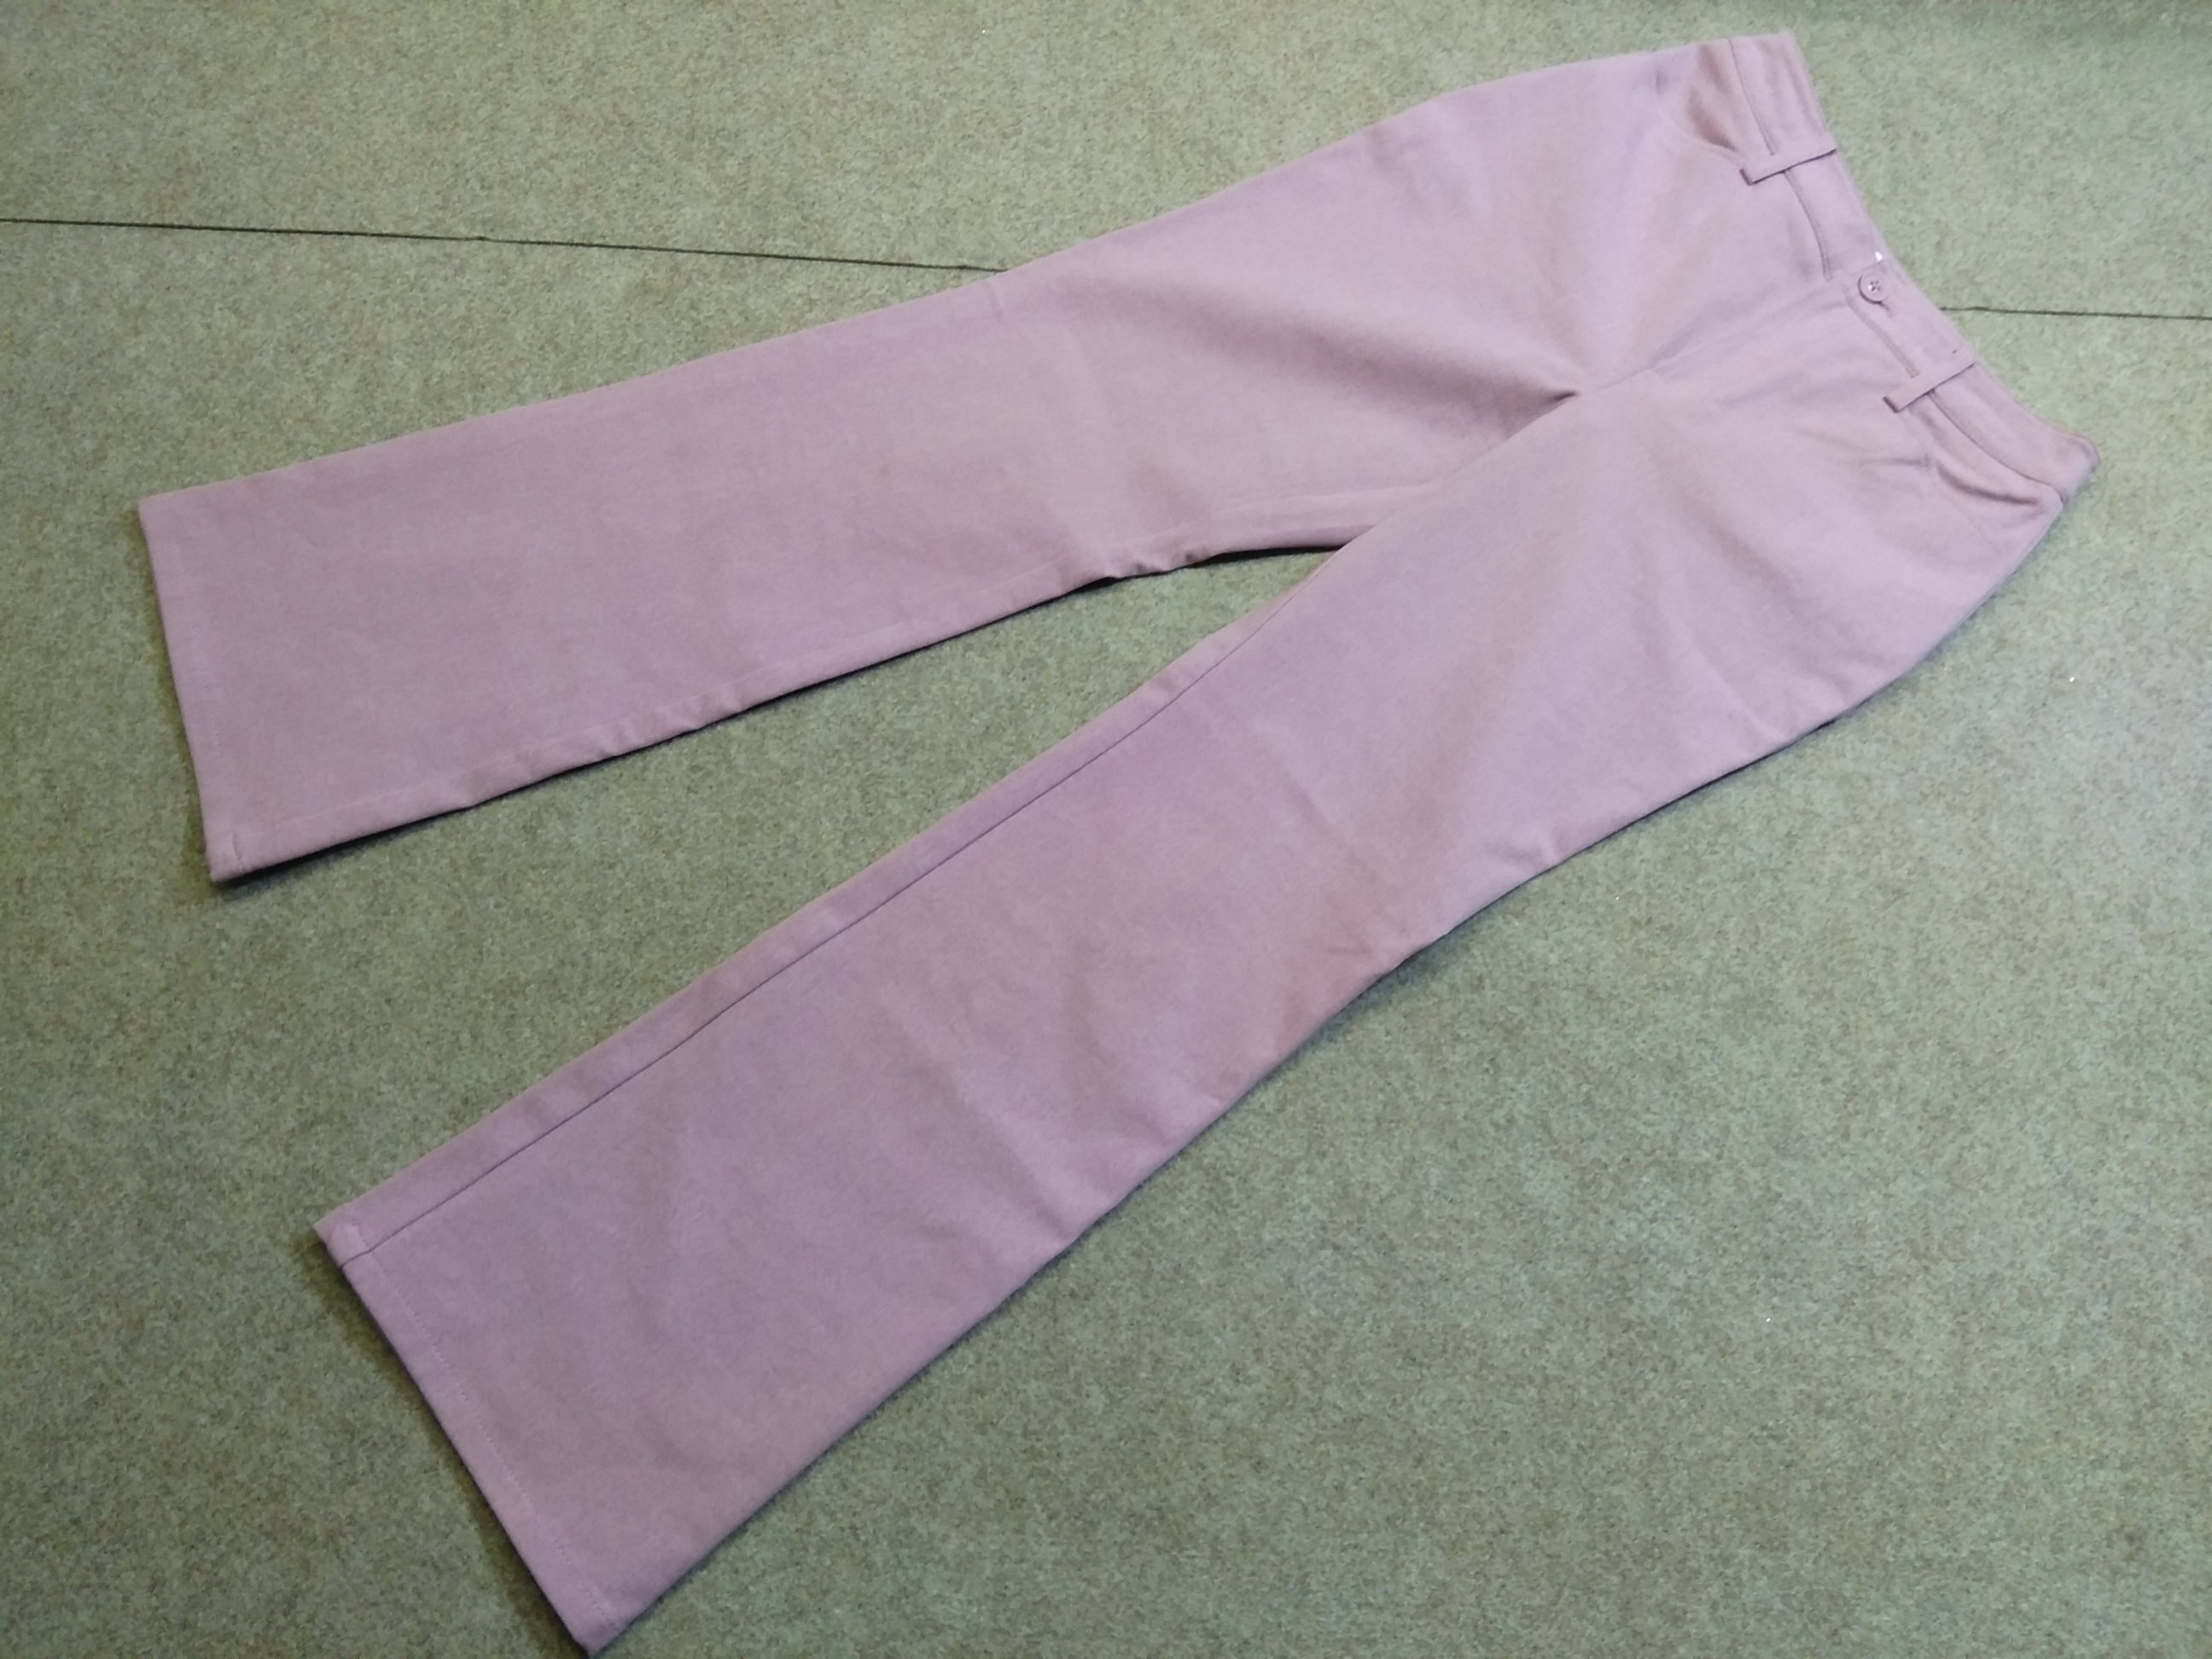 B-Three ビースリー ストレッチ パンツ 30 薄紫 mu965c